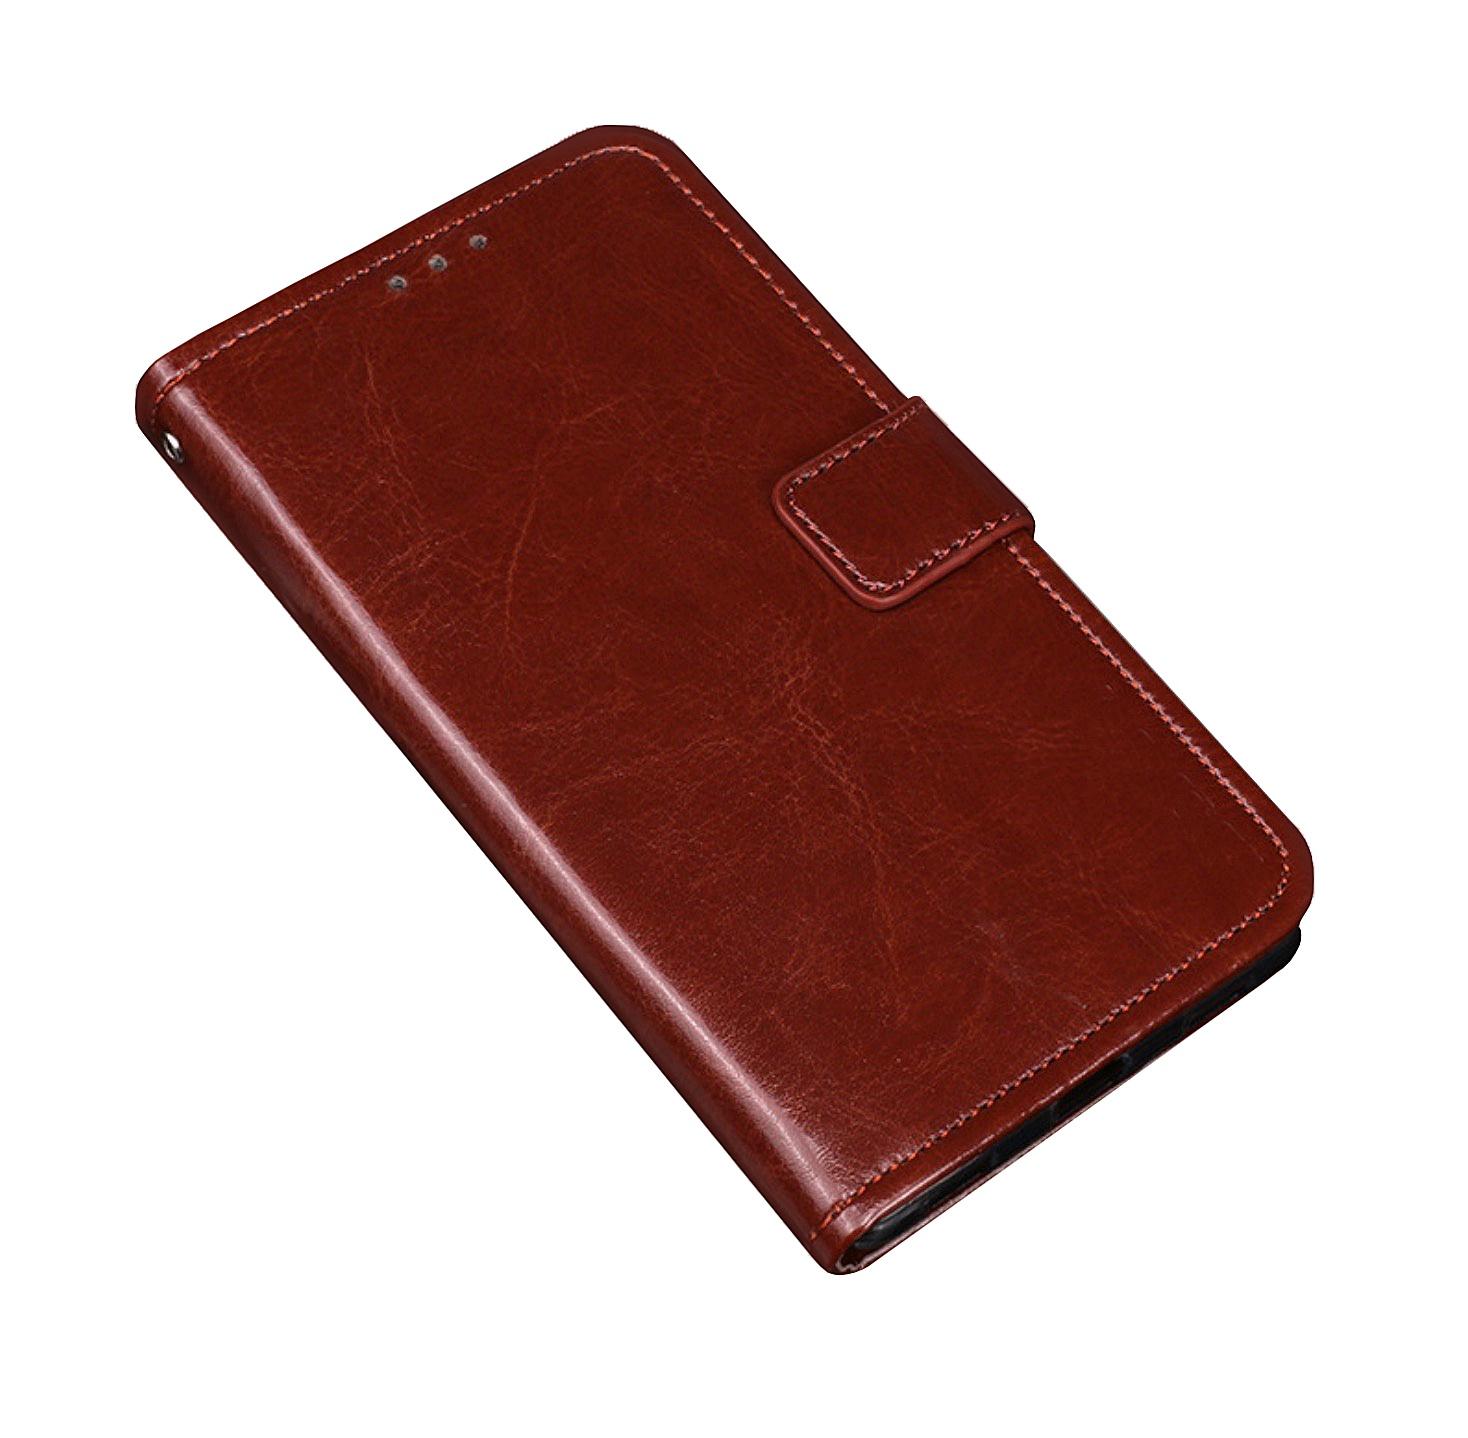 Чехол-книжка MyPads для LG G7 ThinQ / LG G7 с мульти-подставкой застёжкой и визитницей коричневый смартфон lg g7 thinq 64 гб ледяная платина lmg710emw acispl